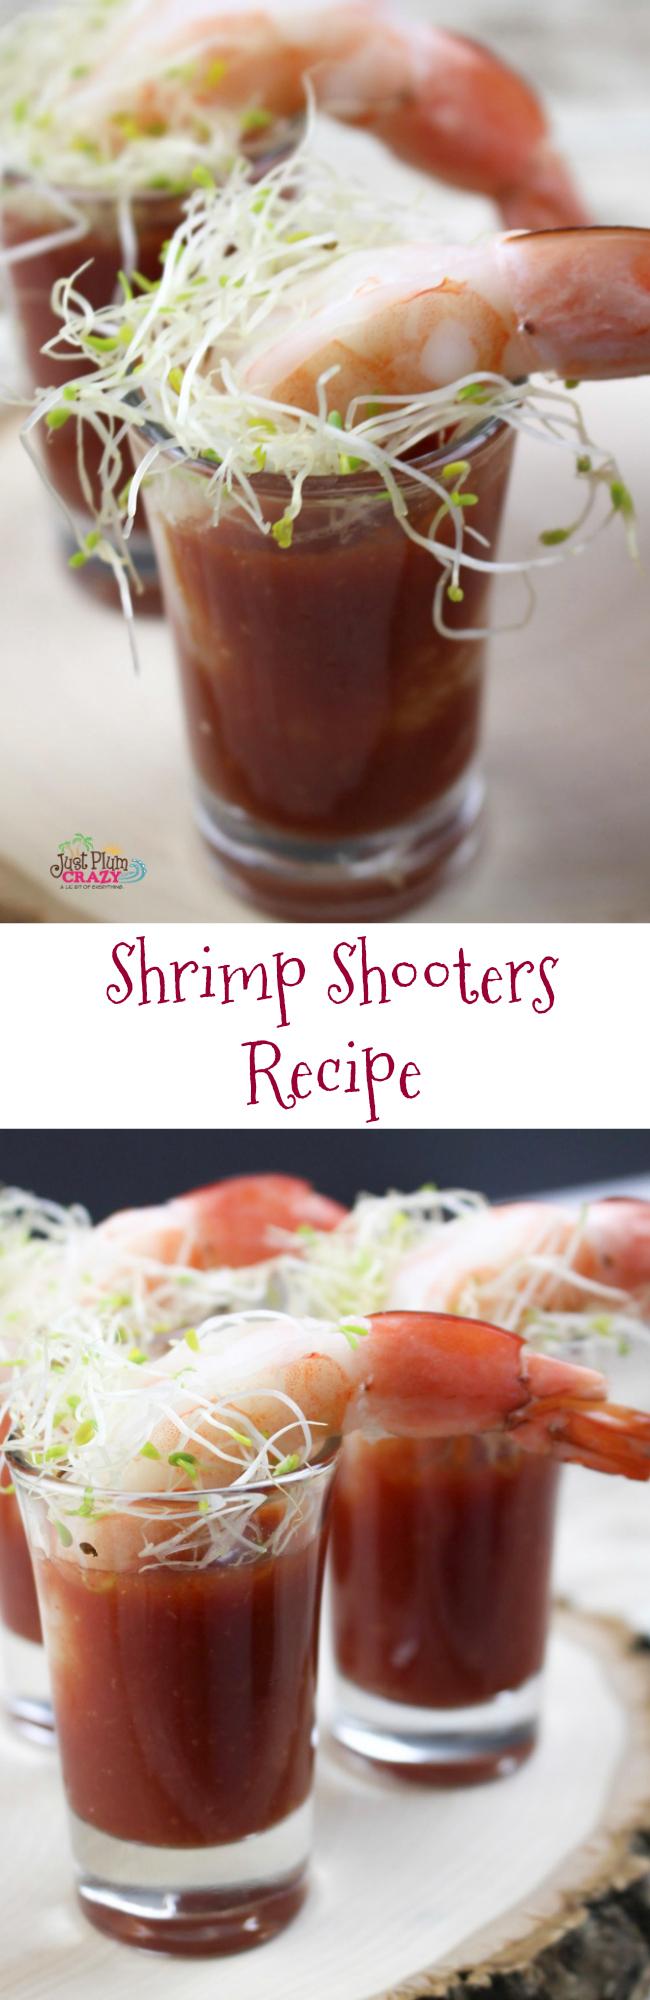 Shooters recipe